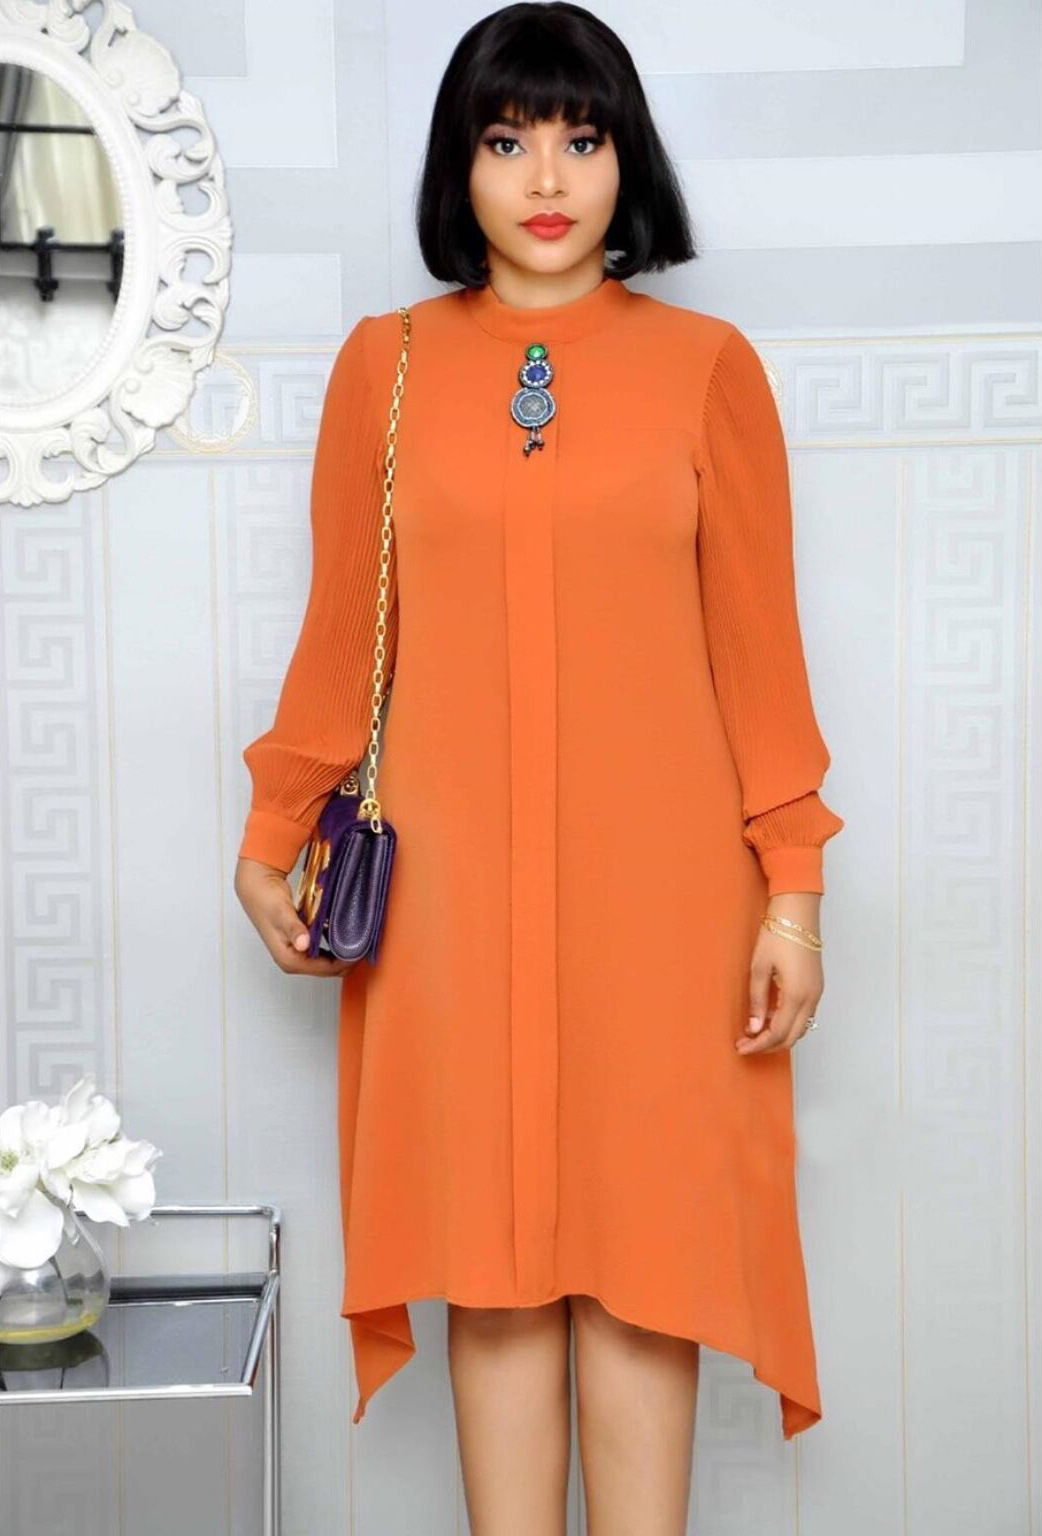 2019 New Arrival Autumn Elegent Fashion Style African Women Beauty Plus Size Dress M-XXL